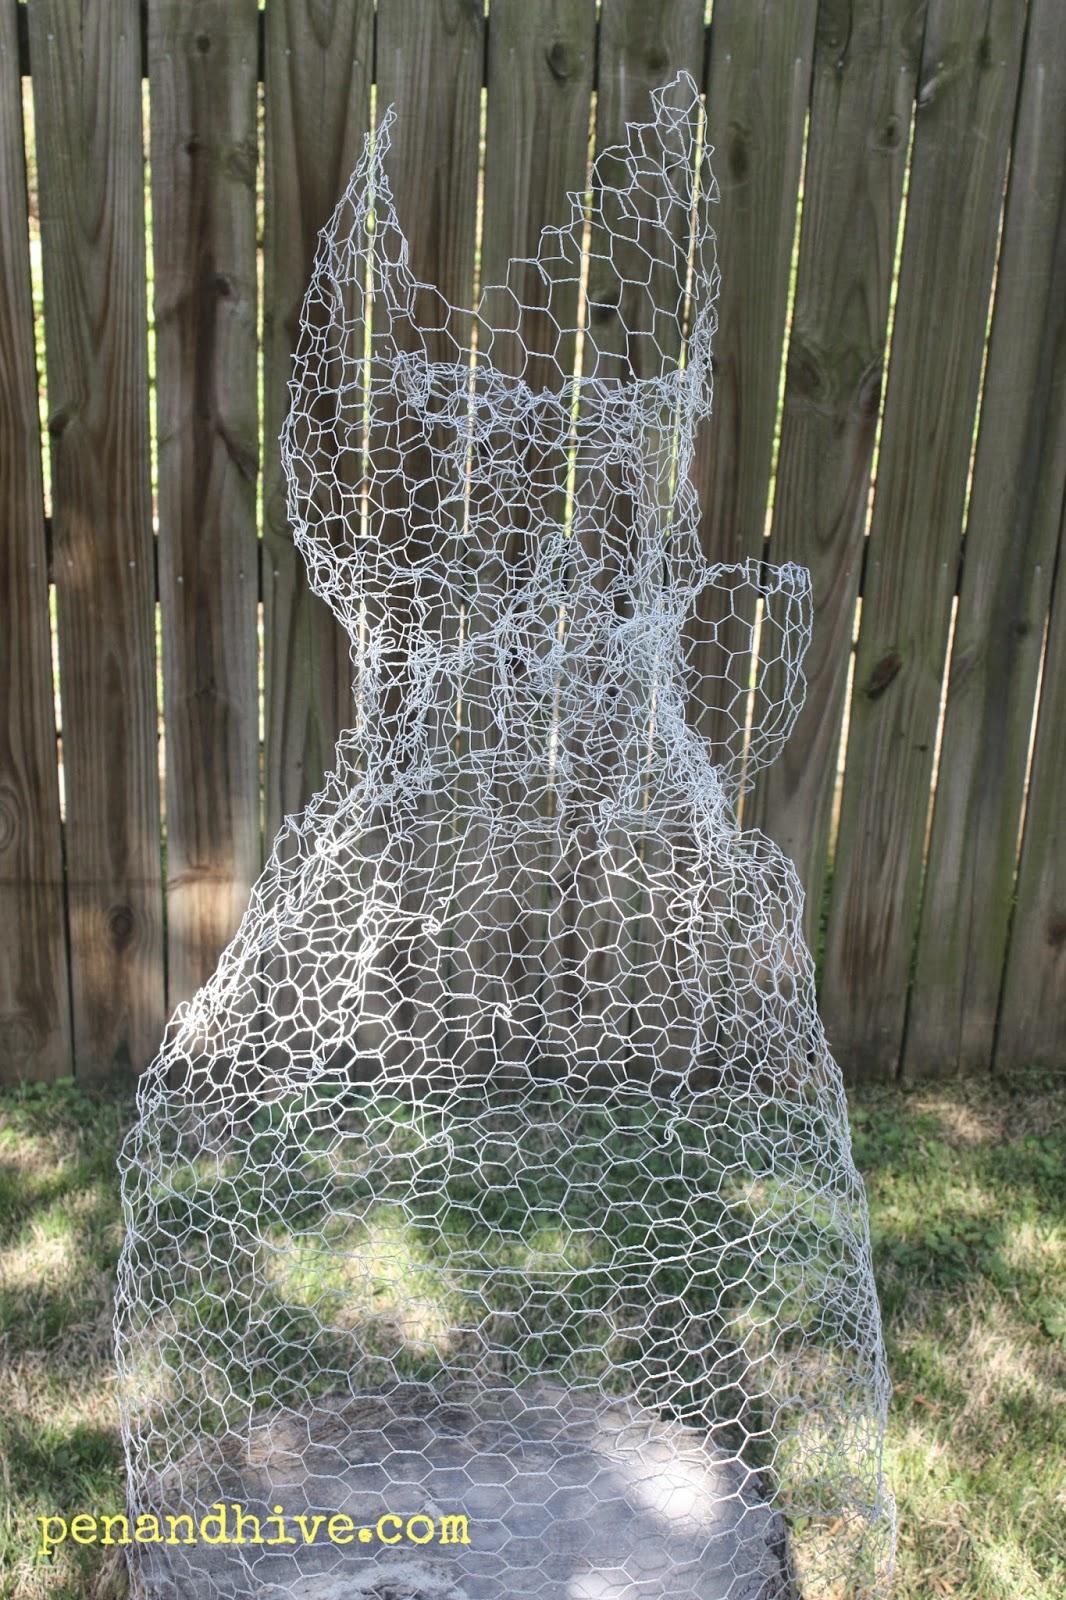 Pen & Hive: Chicken Wire Ghost Sculpture for Garden